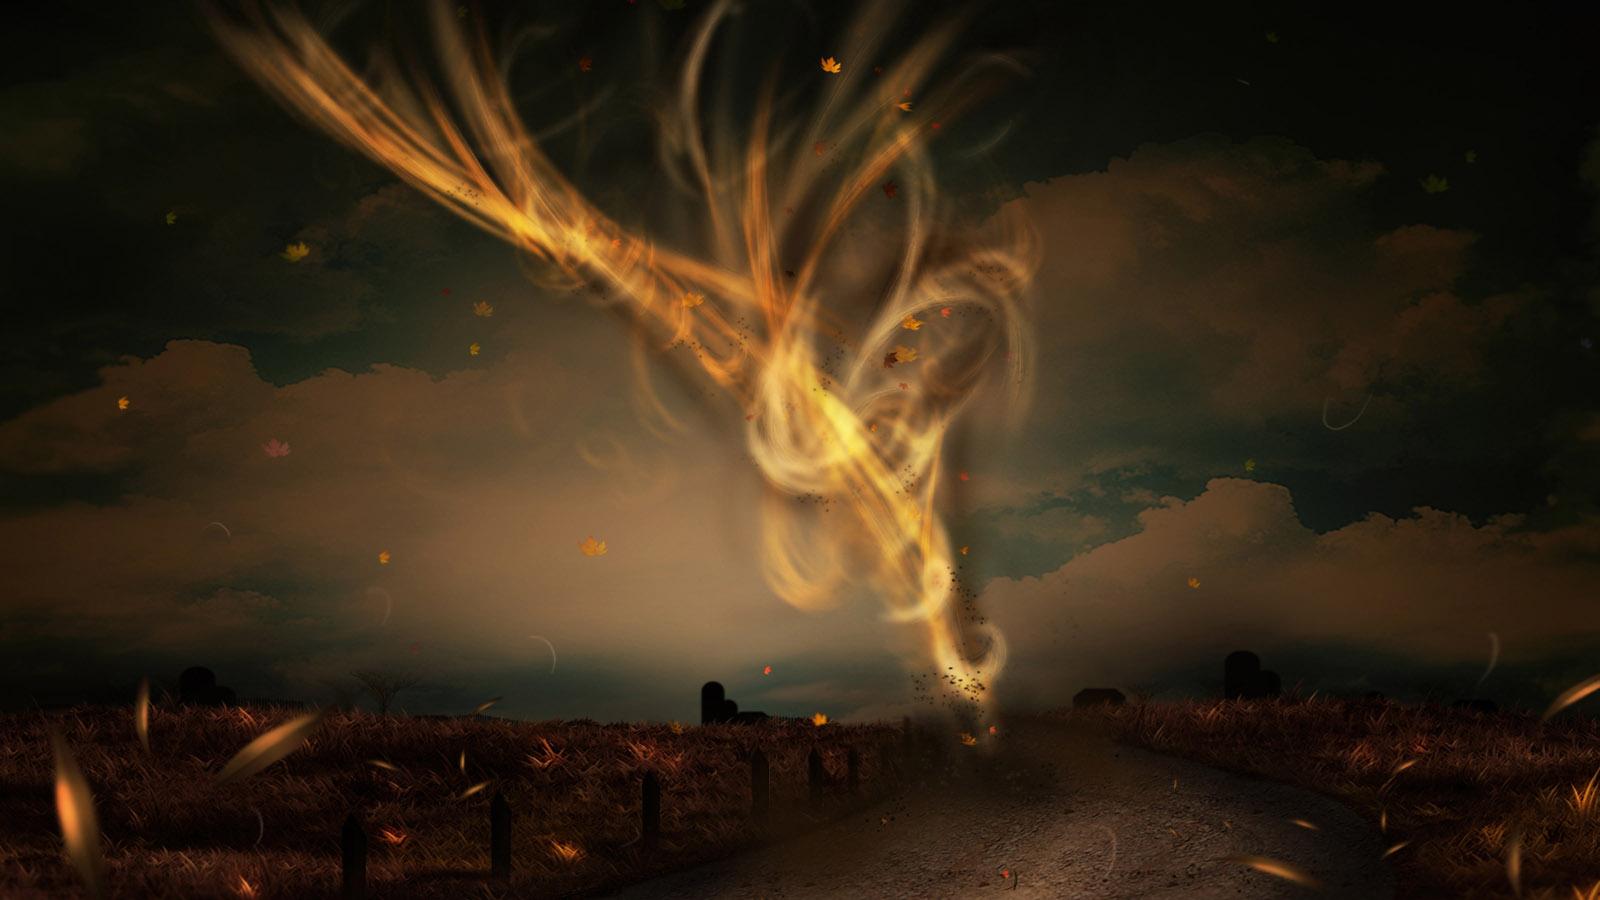 Abstract Tornado